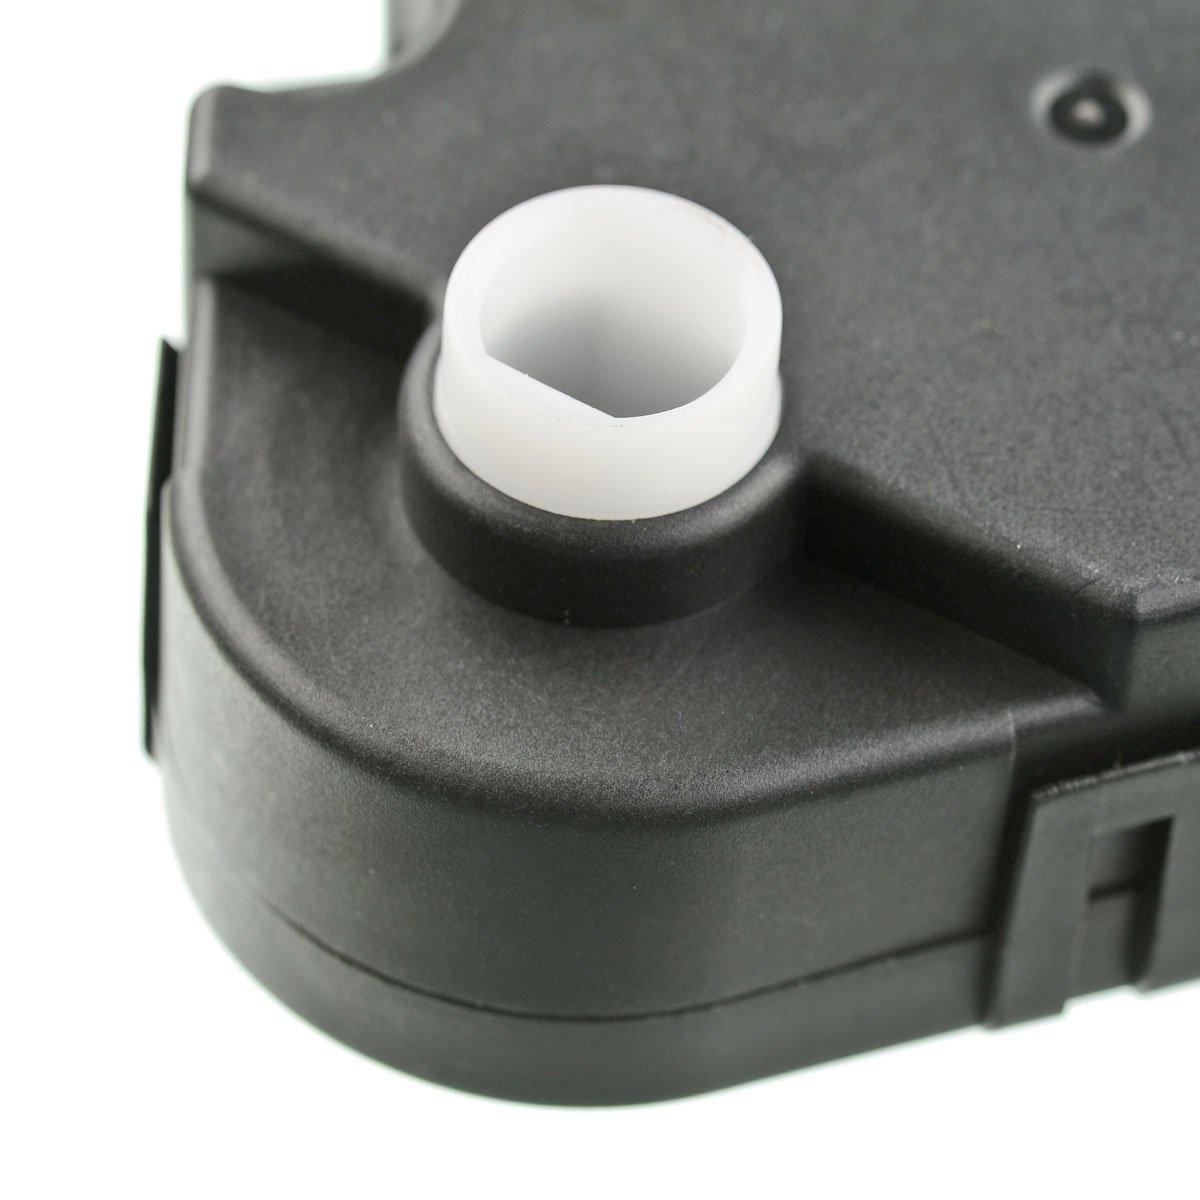 Stellmotor Regolatore di riscaldamento Klima AC per W163 ML230 ML270 ML320 ML350 ML400 ML430 ML500 ML55 AMG 1998-2005 604-938 1638200108